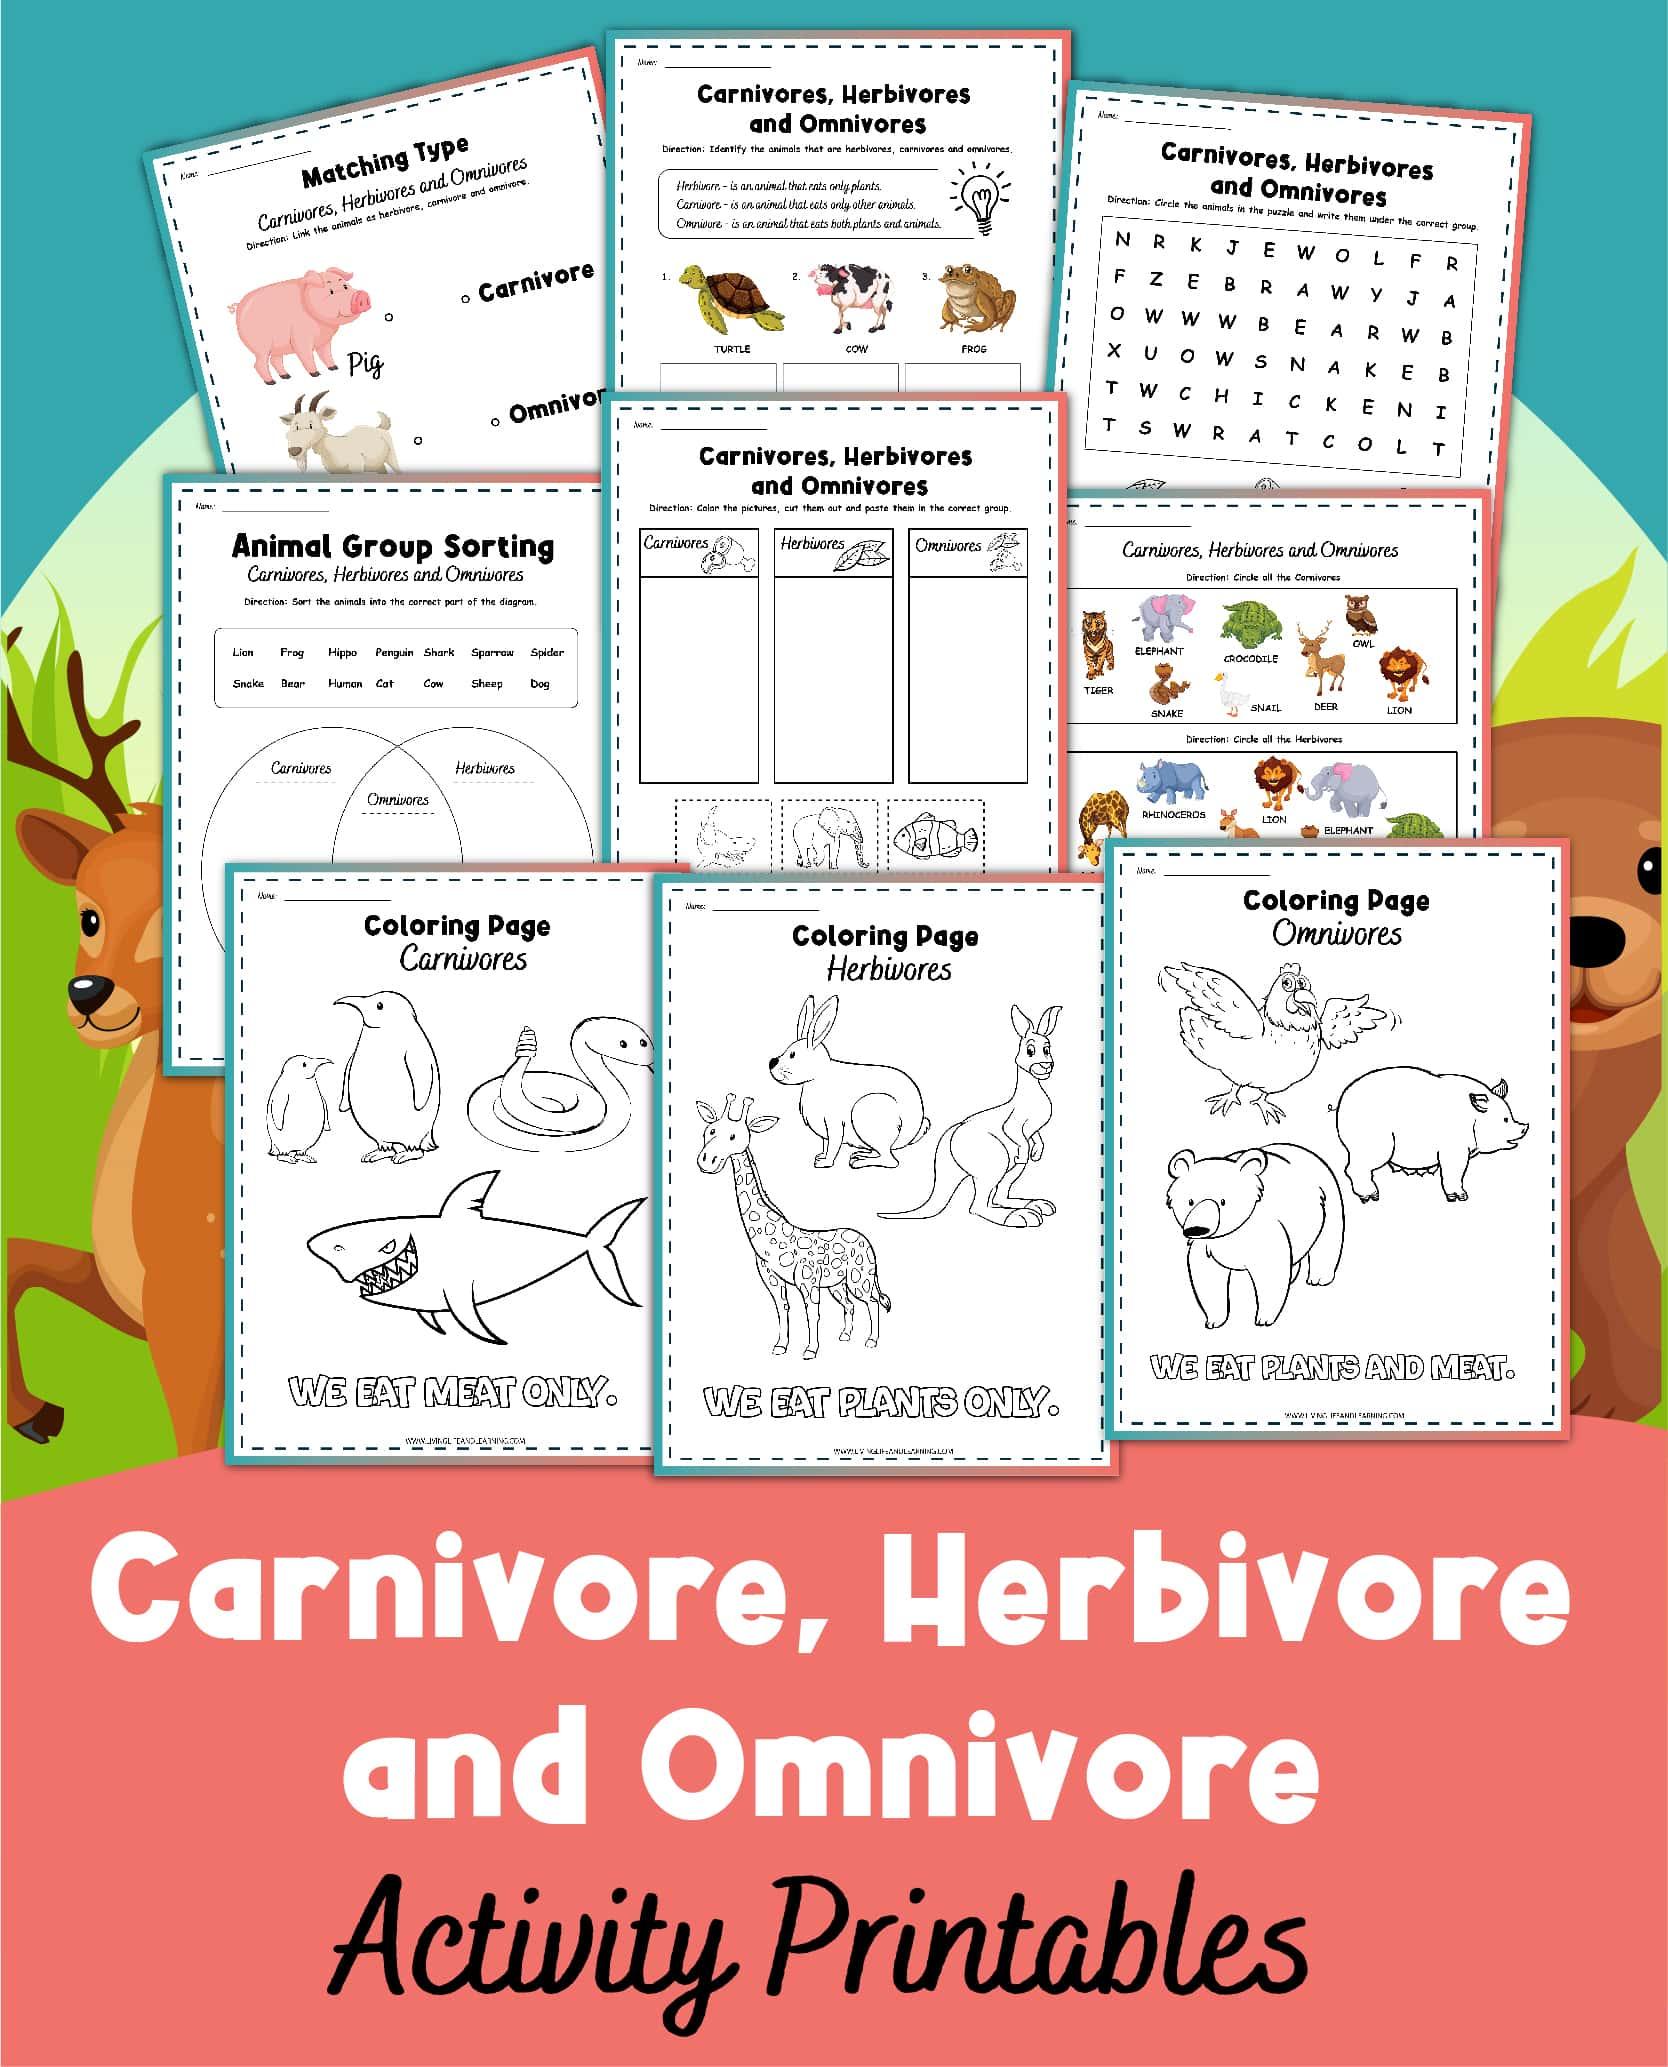 Carnivore, Herbivore, and Omnivore Worksheets